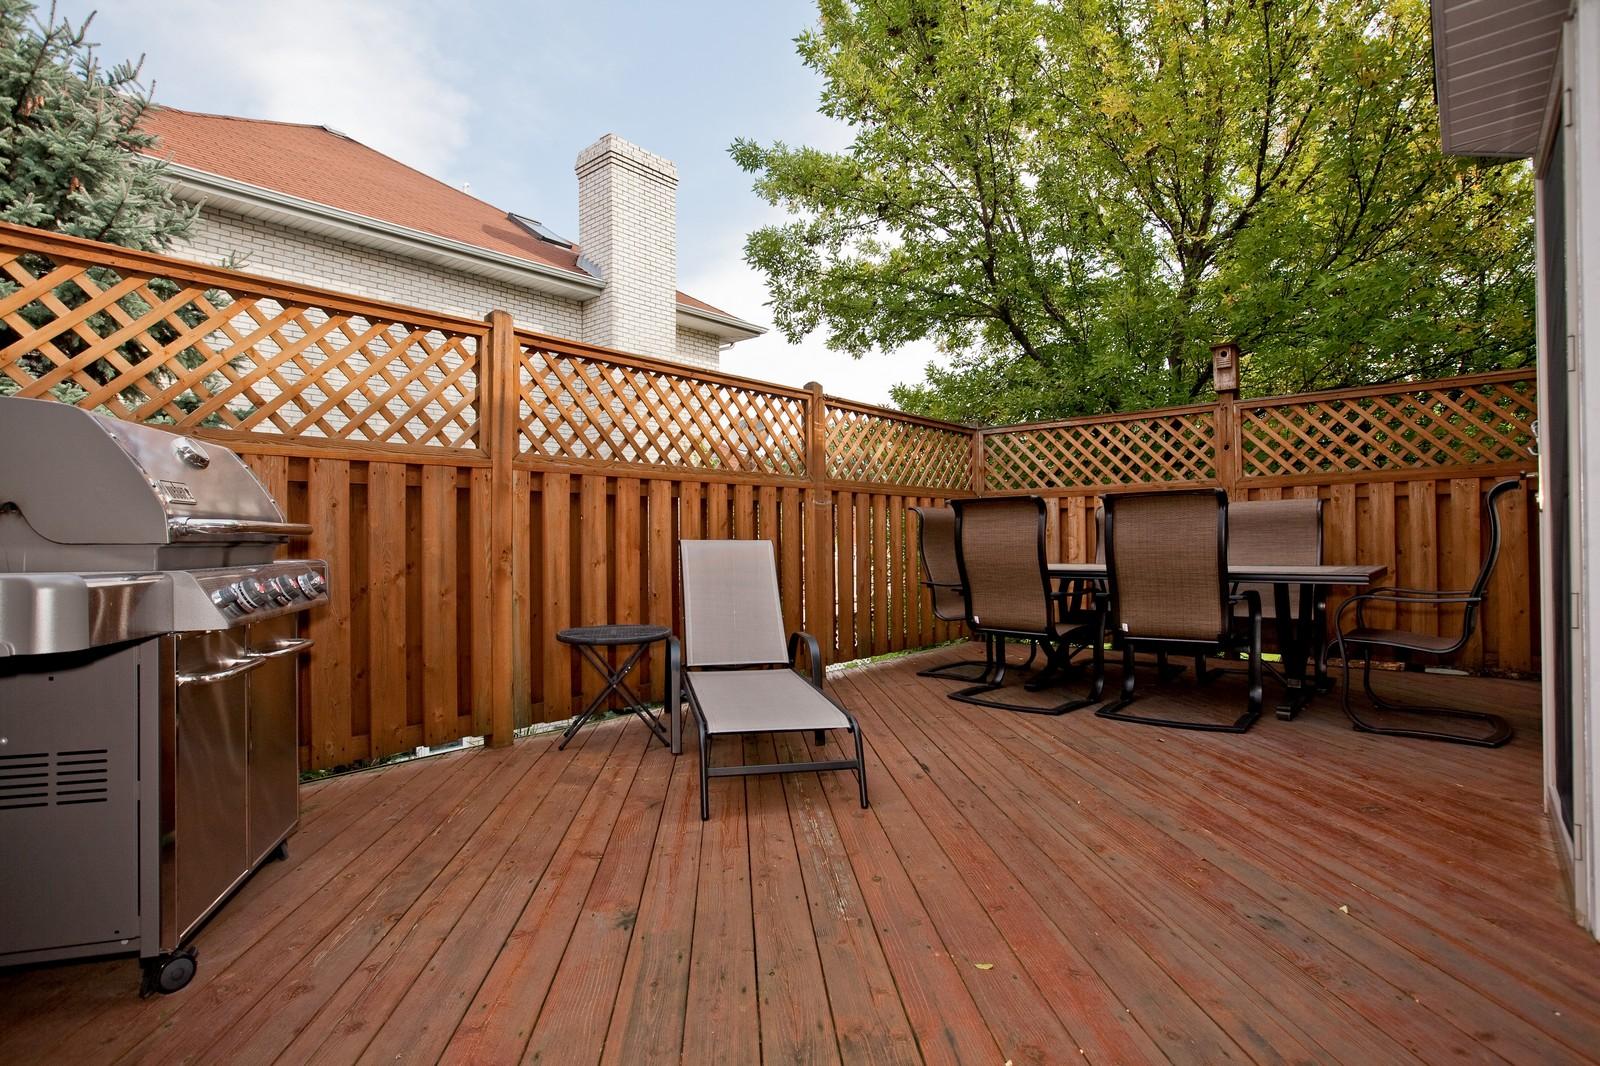 Real Estate Photography - 1031 W. 119th St, Lemont, IL, 60439 - Deck